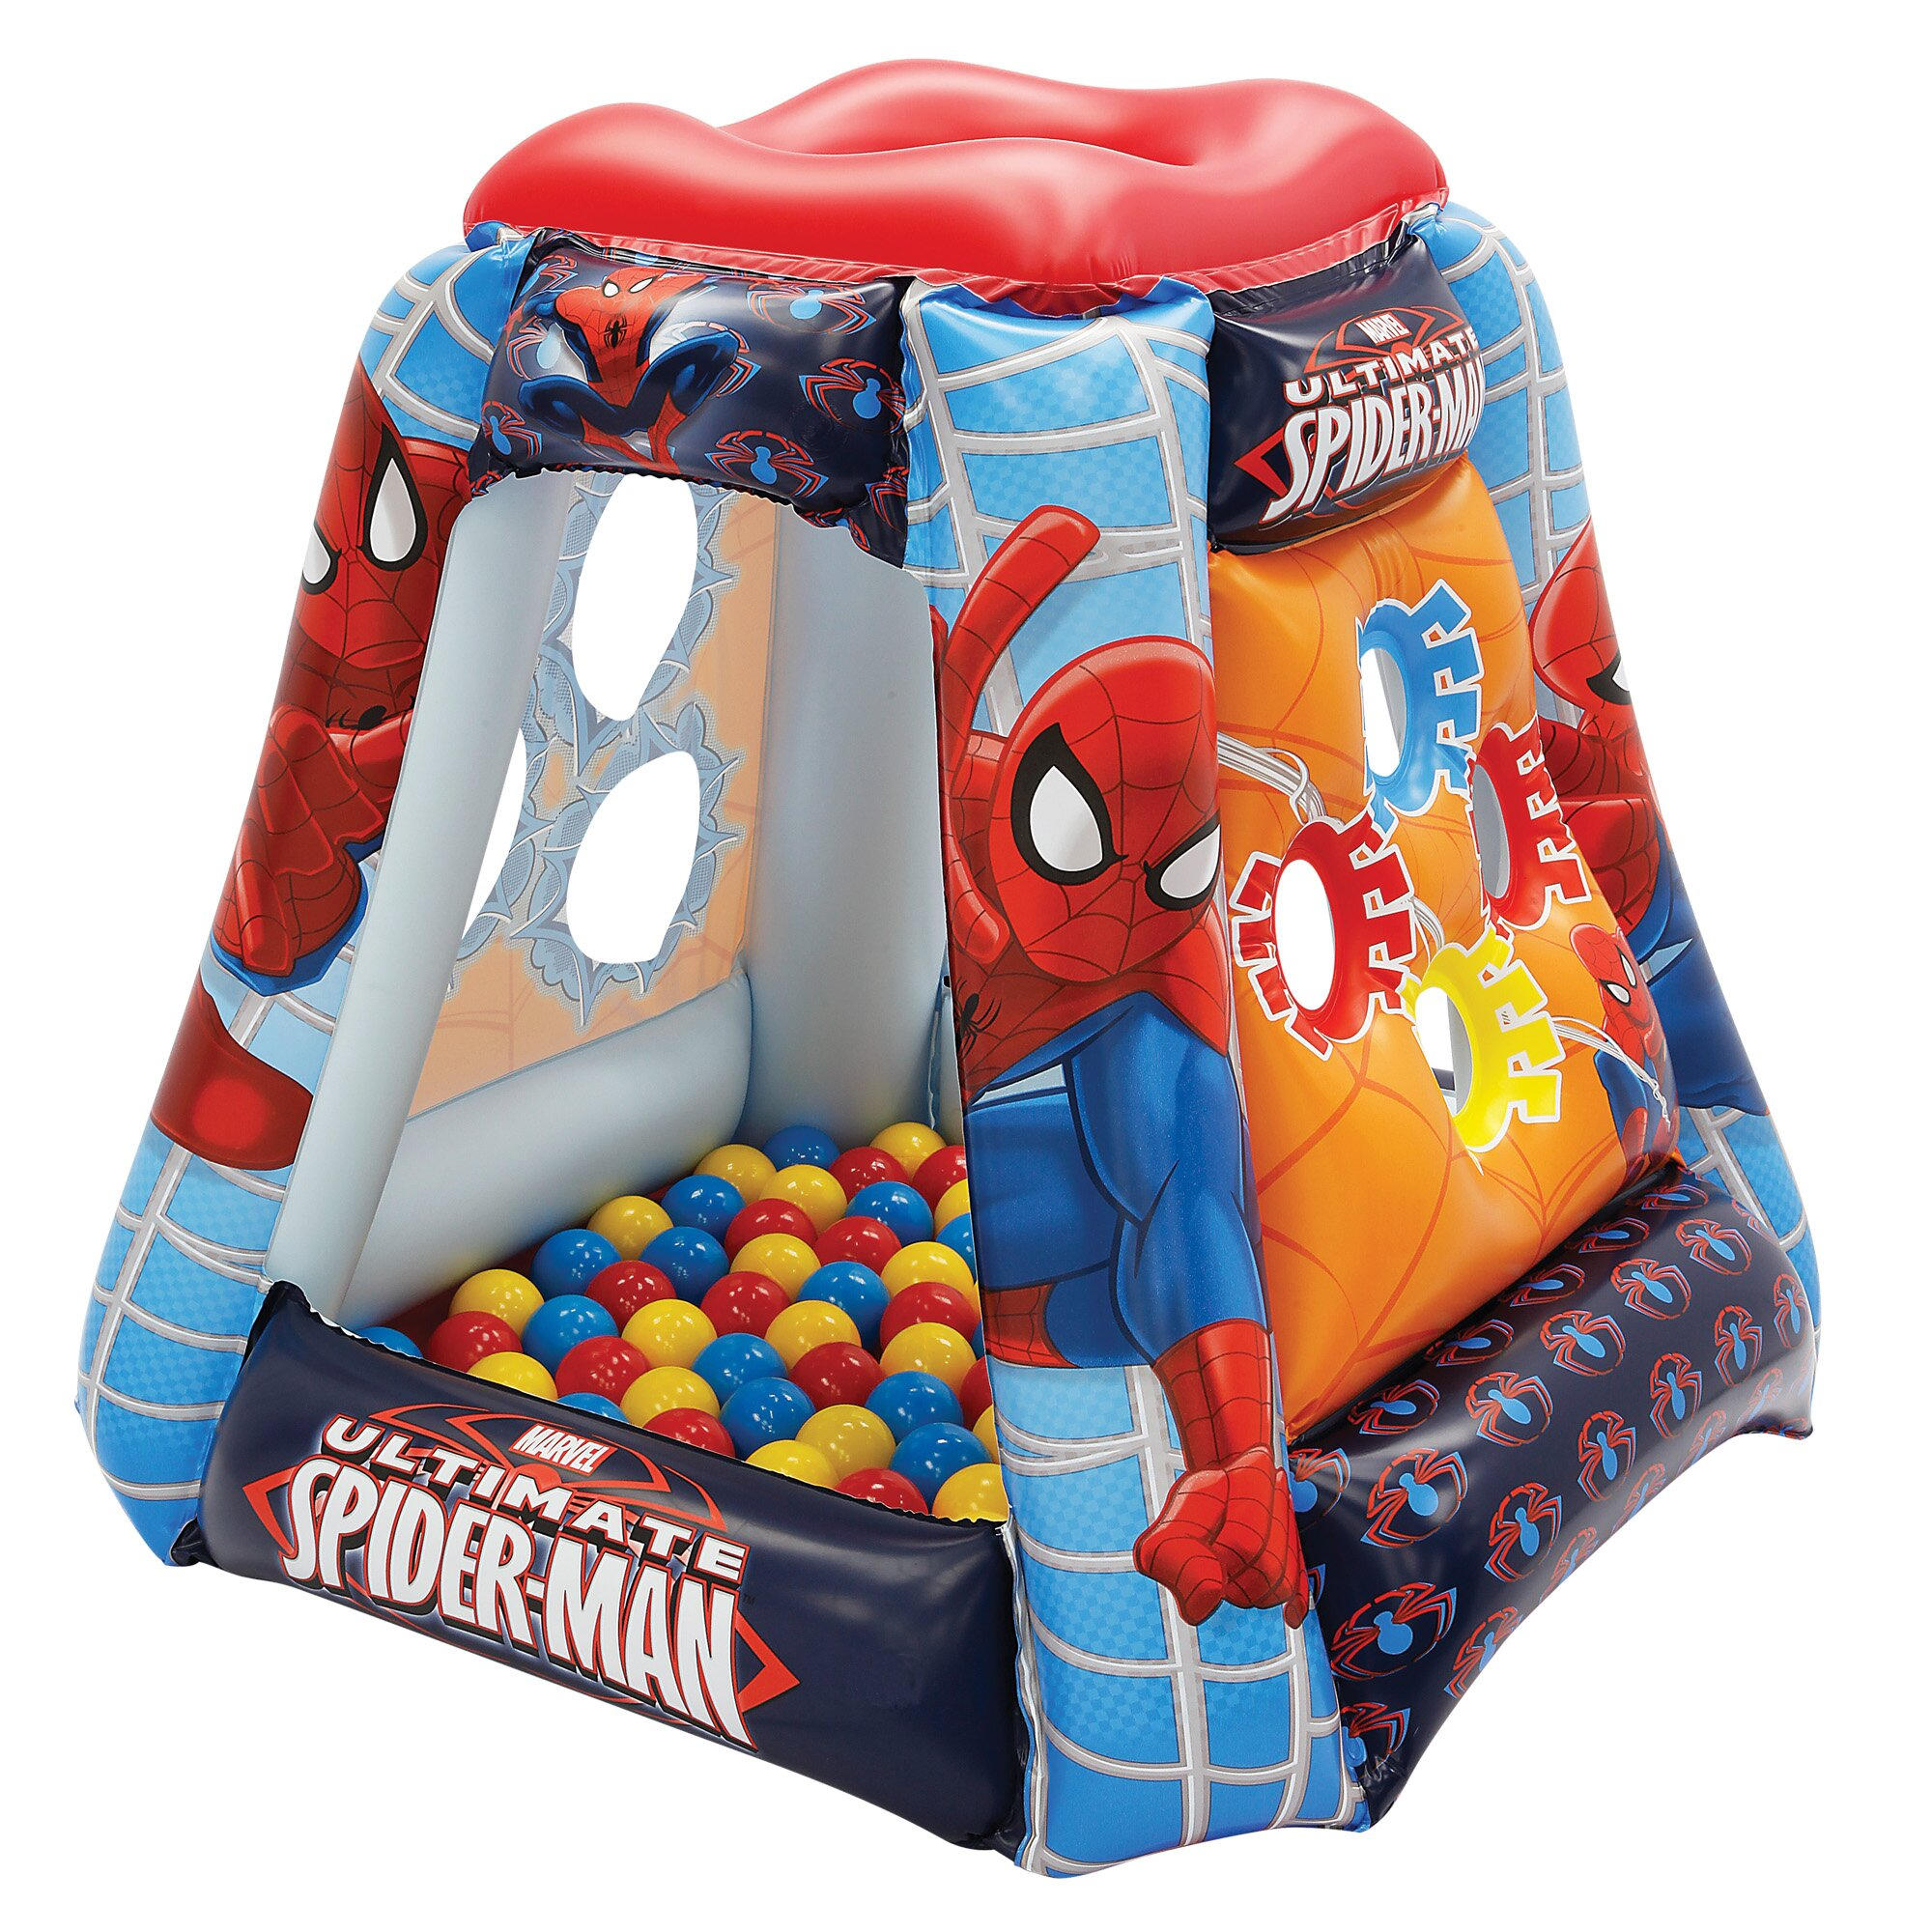 Ultimate Spiderman Spider Power Playland Play Tent Wayfair